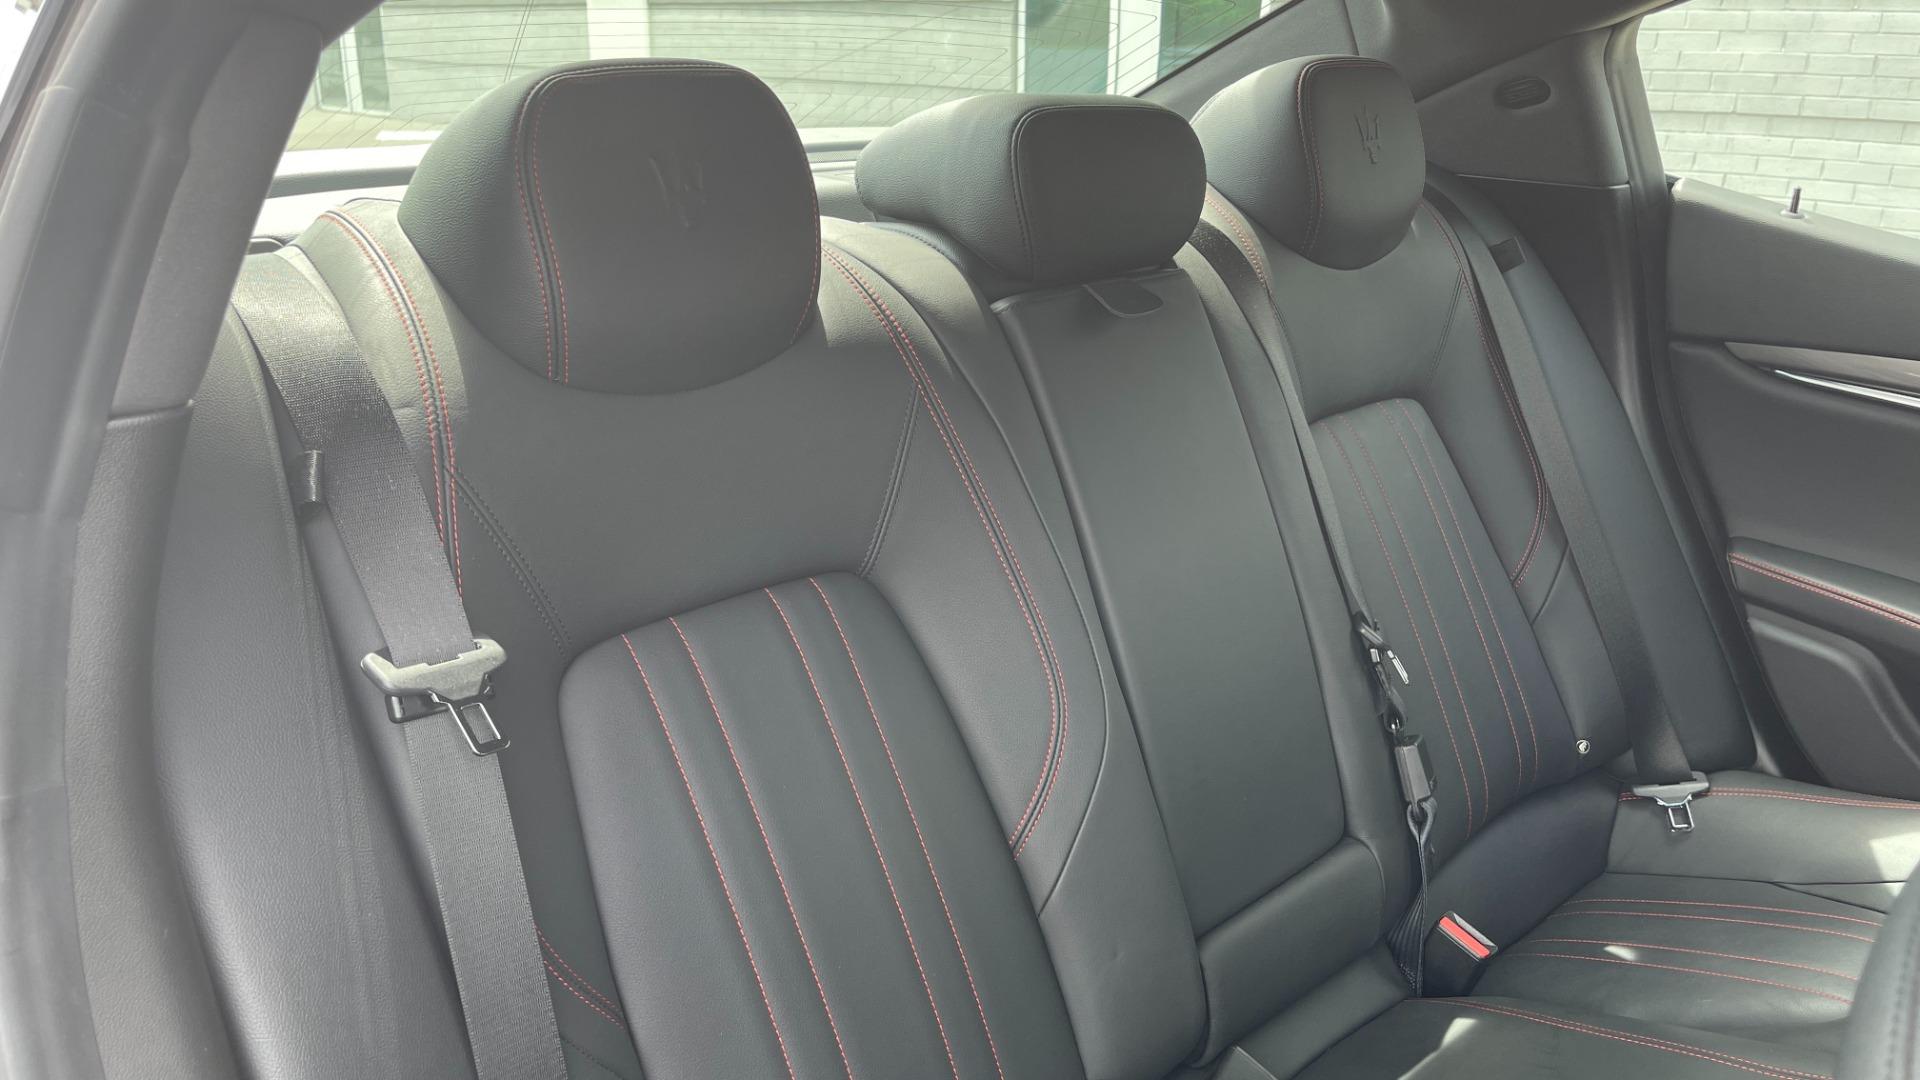 Used 2018 Maserati GHIBLI S Q4 SEDAN / AWD / 3.0L V6 / SUNROOF / NAV / REARVIEW for sale $51,995 at Formula Imports in Charlotte NC 28227 60